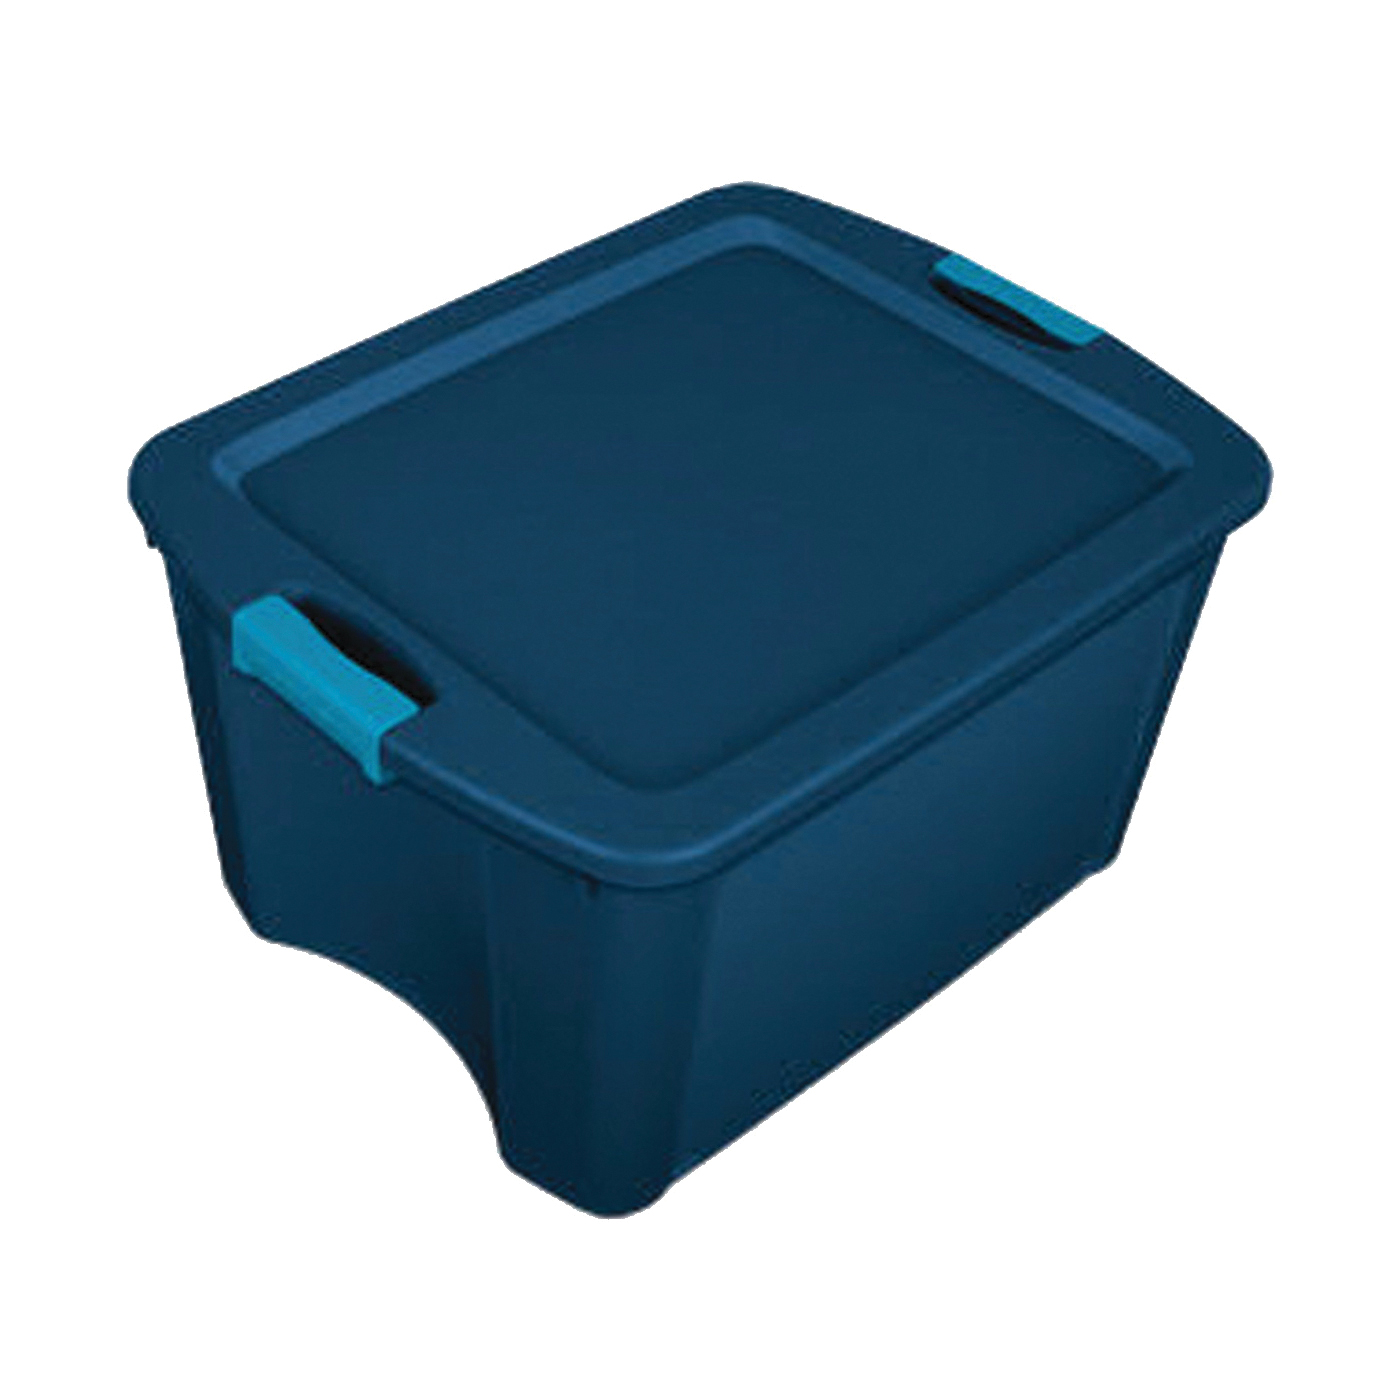 Picture of Sterilite 14467406 Carry Tote, Plastic, True Blue, 23-5/8 in L, 18-5/8 in W, 13-5/8 in H